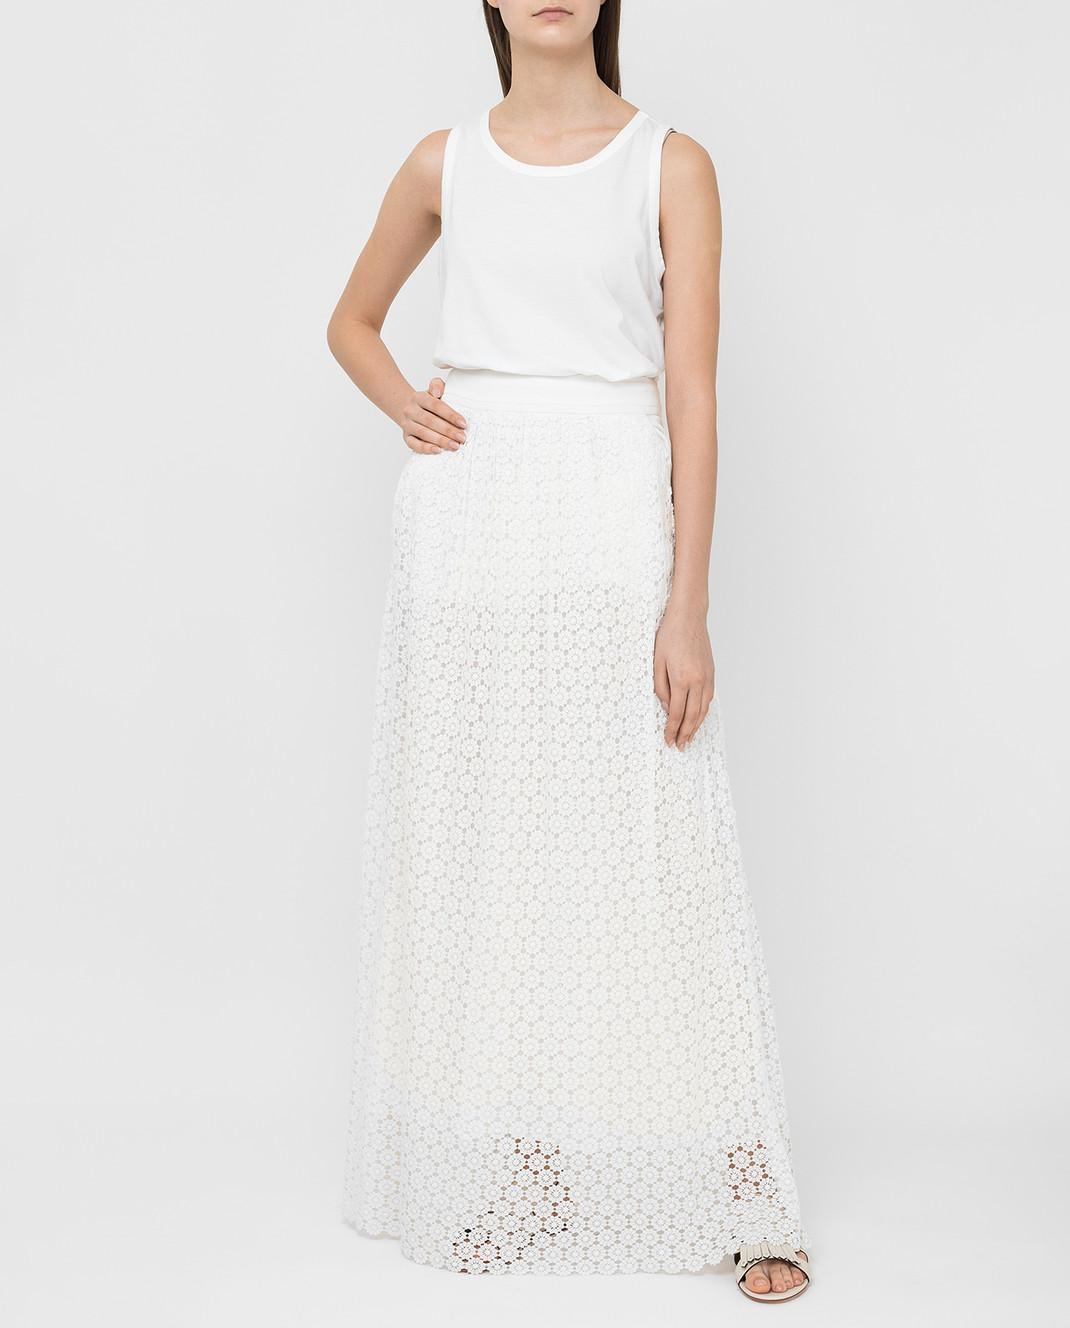 Veronique Branquinho Белая юбка VPG101AVG151A изображение 2